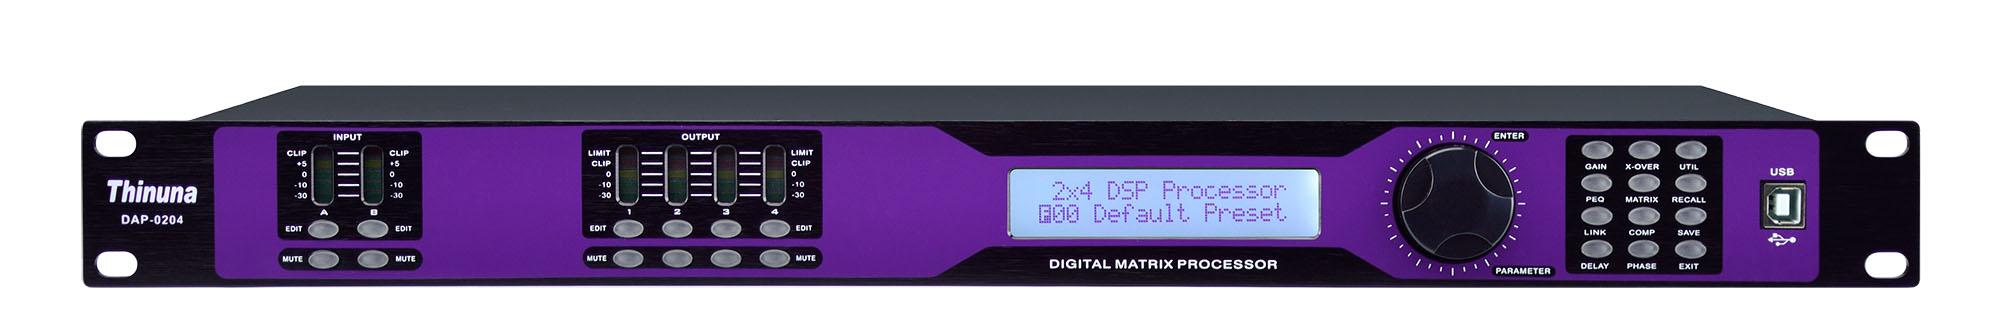 DAP-0408 Four input Eight output Audio processor